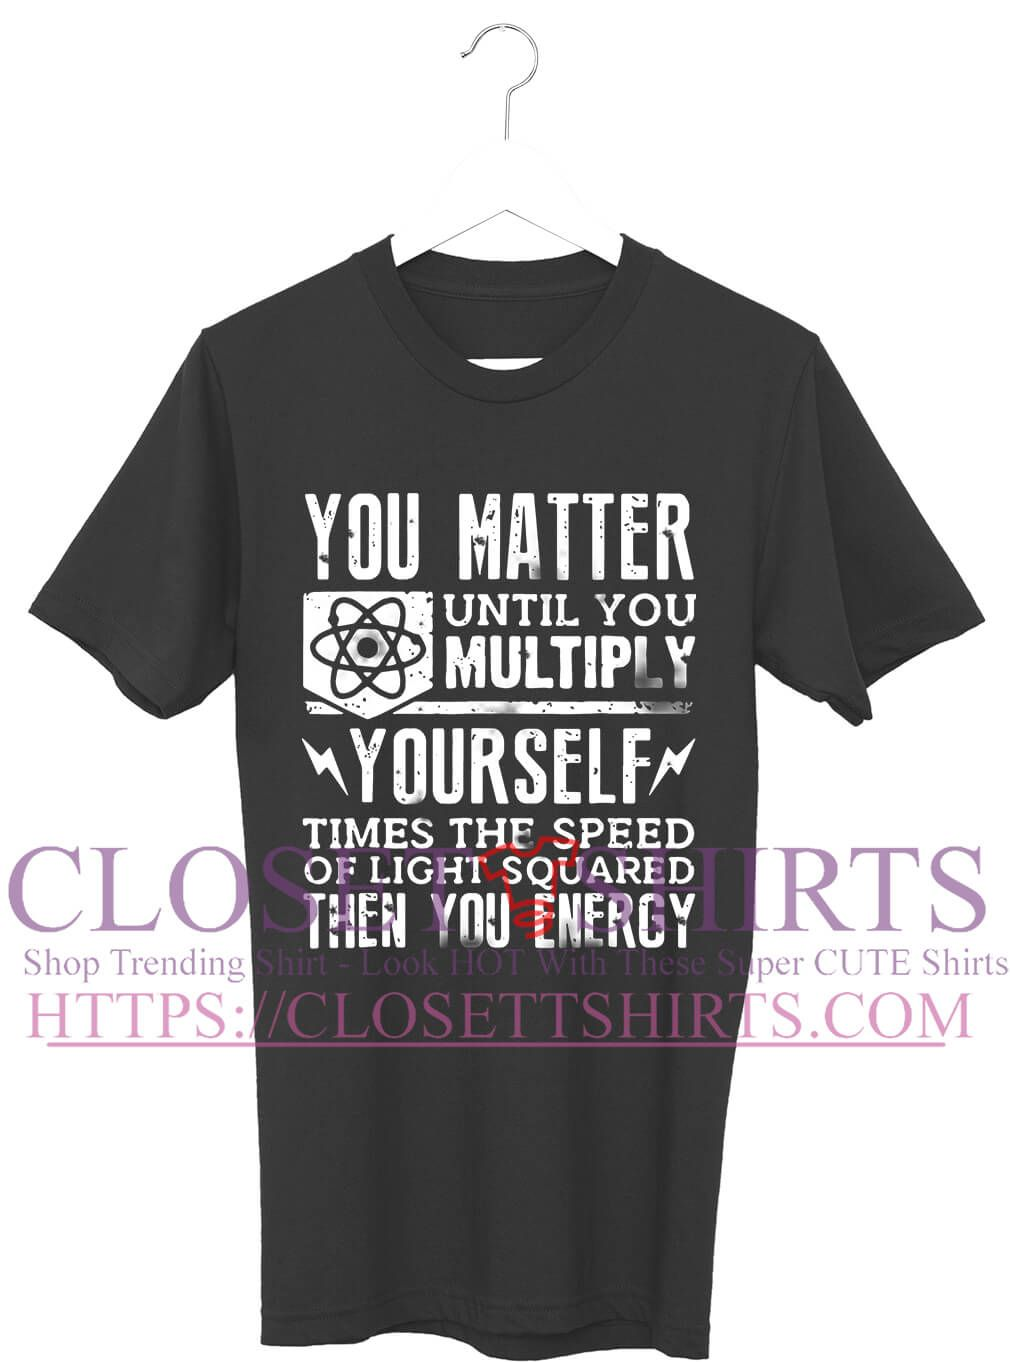 931eb533667 Official you matter until you multiply yourself shirt jpg 1010x1362 You  matter shirt